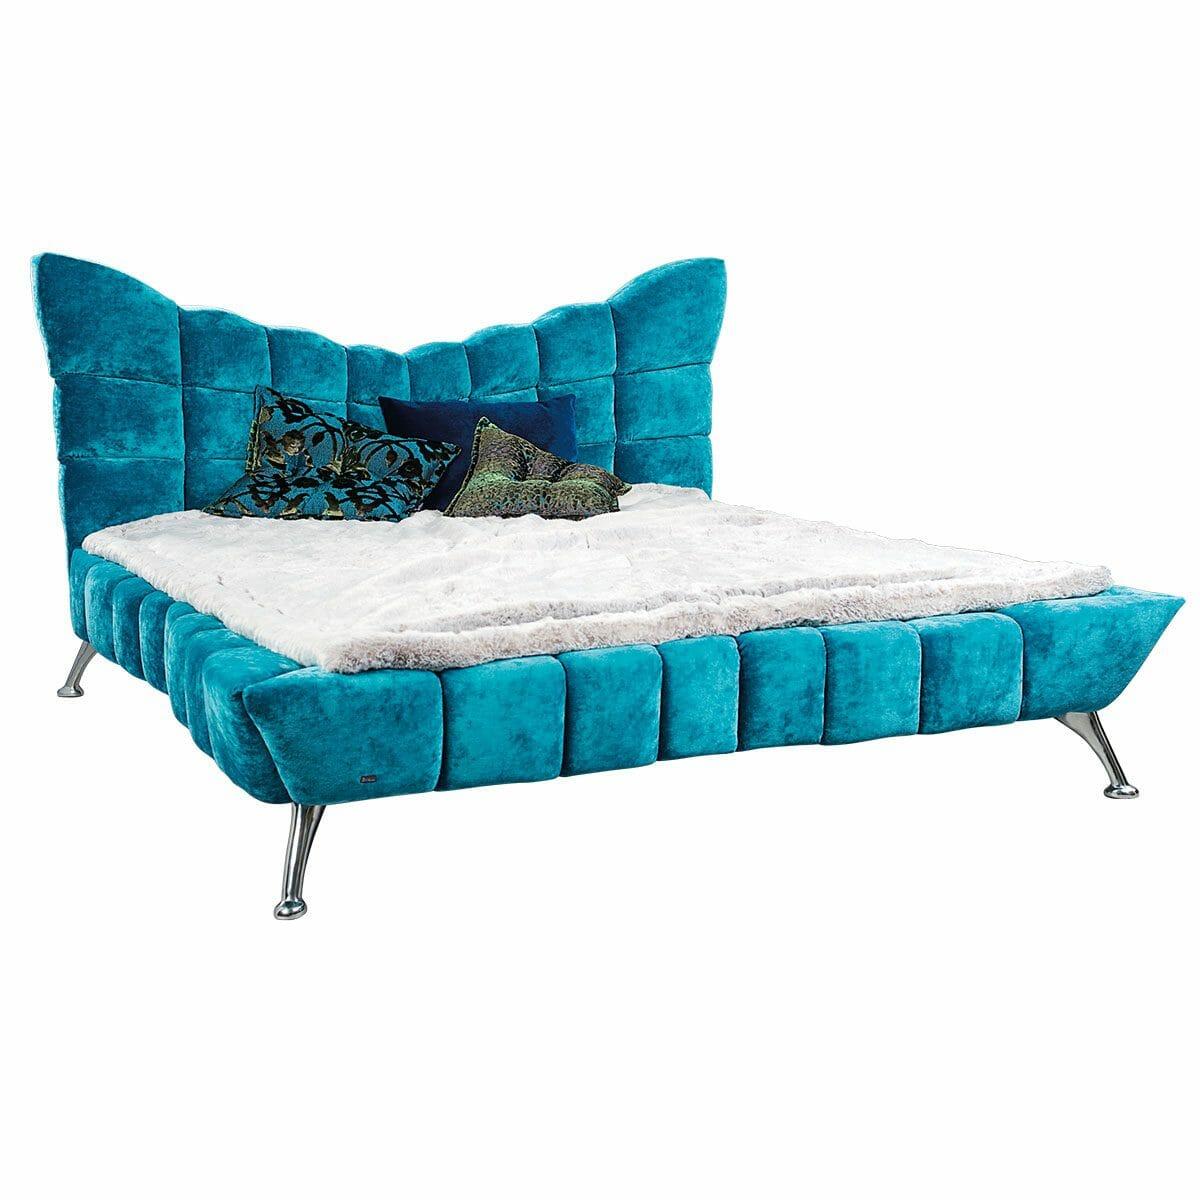 bretz cloud 7 bett w 154 180 top angebote an bretz designbetten. Black Bedroom Furniture Sets. Home Design Ideas